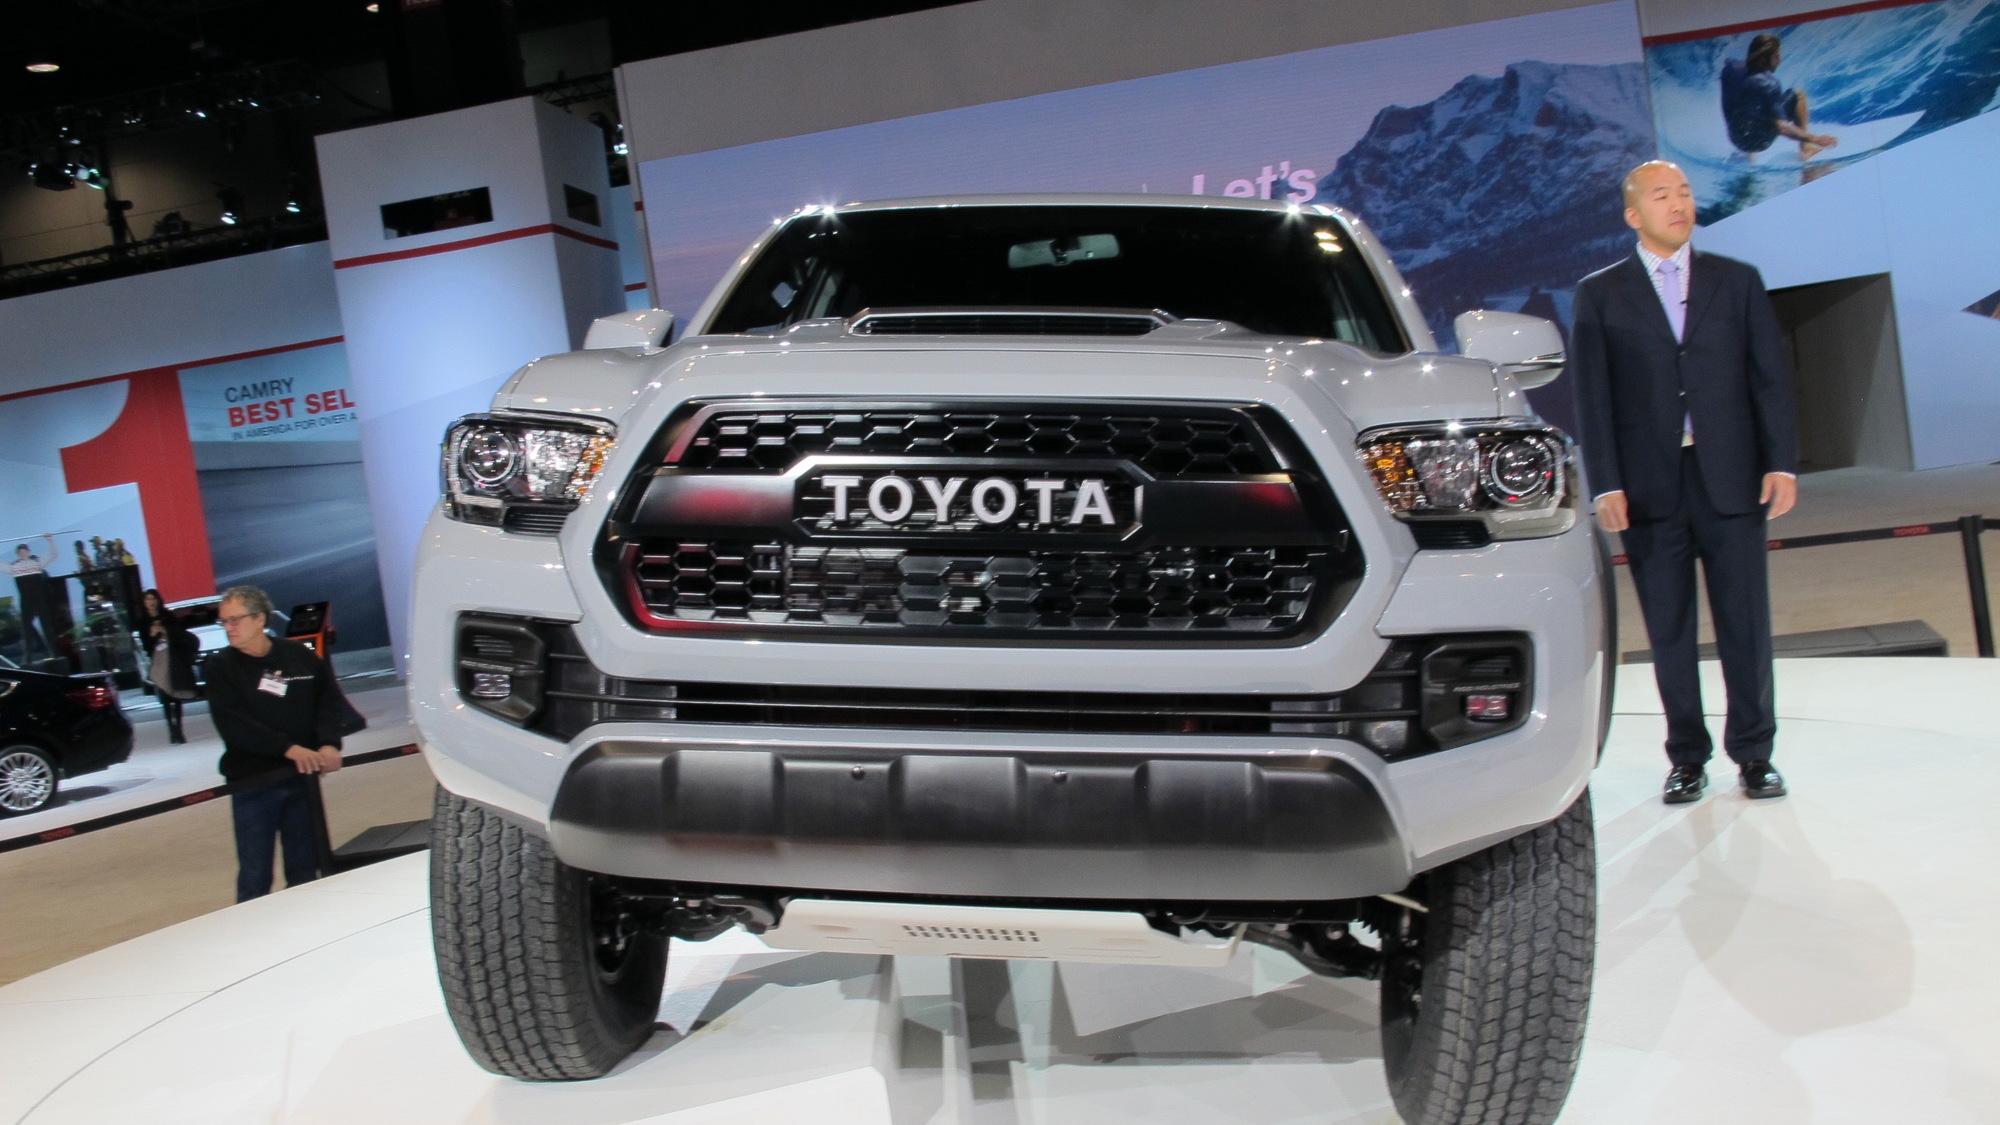 2017 Toyota Tacoma TRD Pro, 2016 Chicago Auto Show